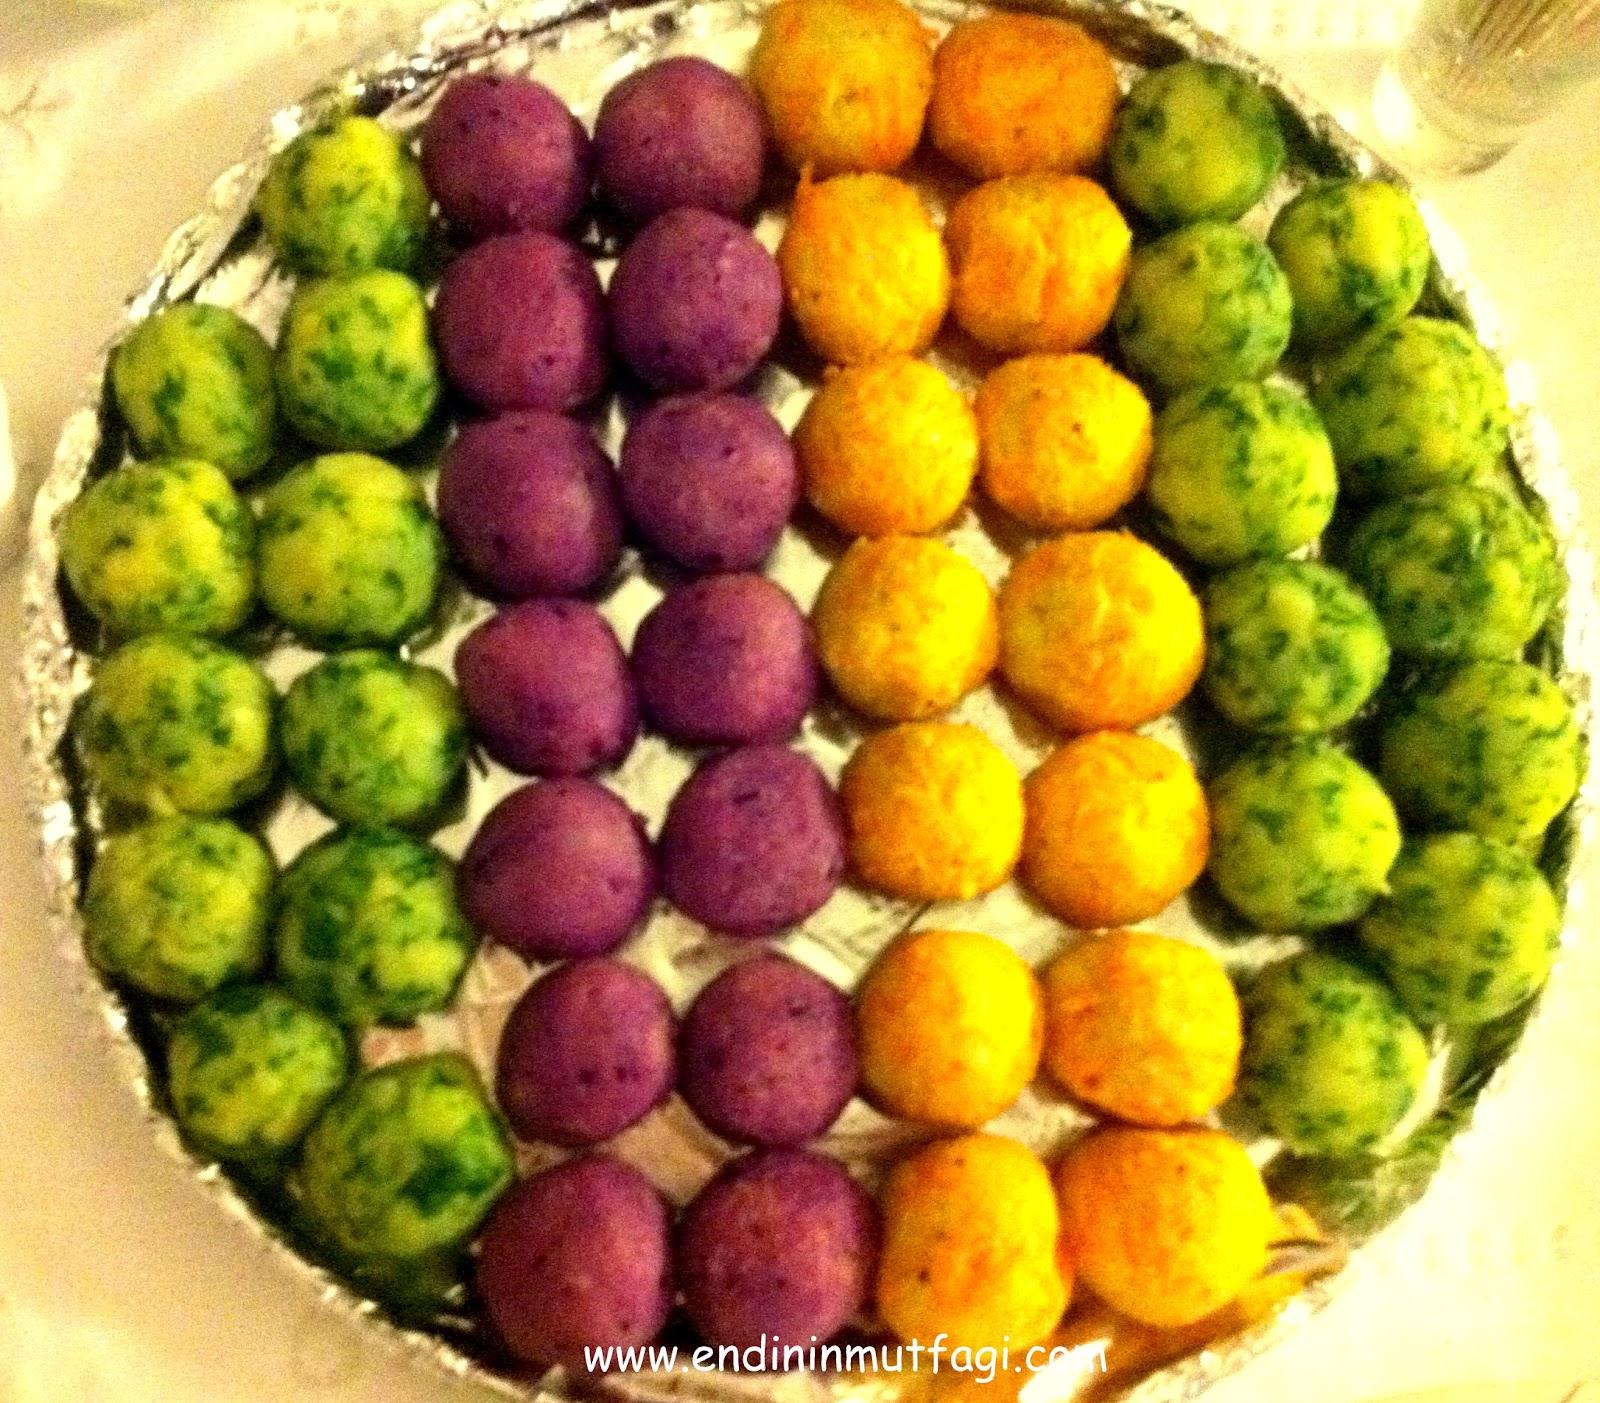 Sebzeli Top Patates Tarifi